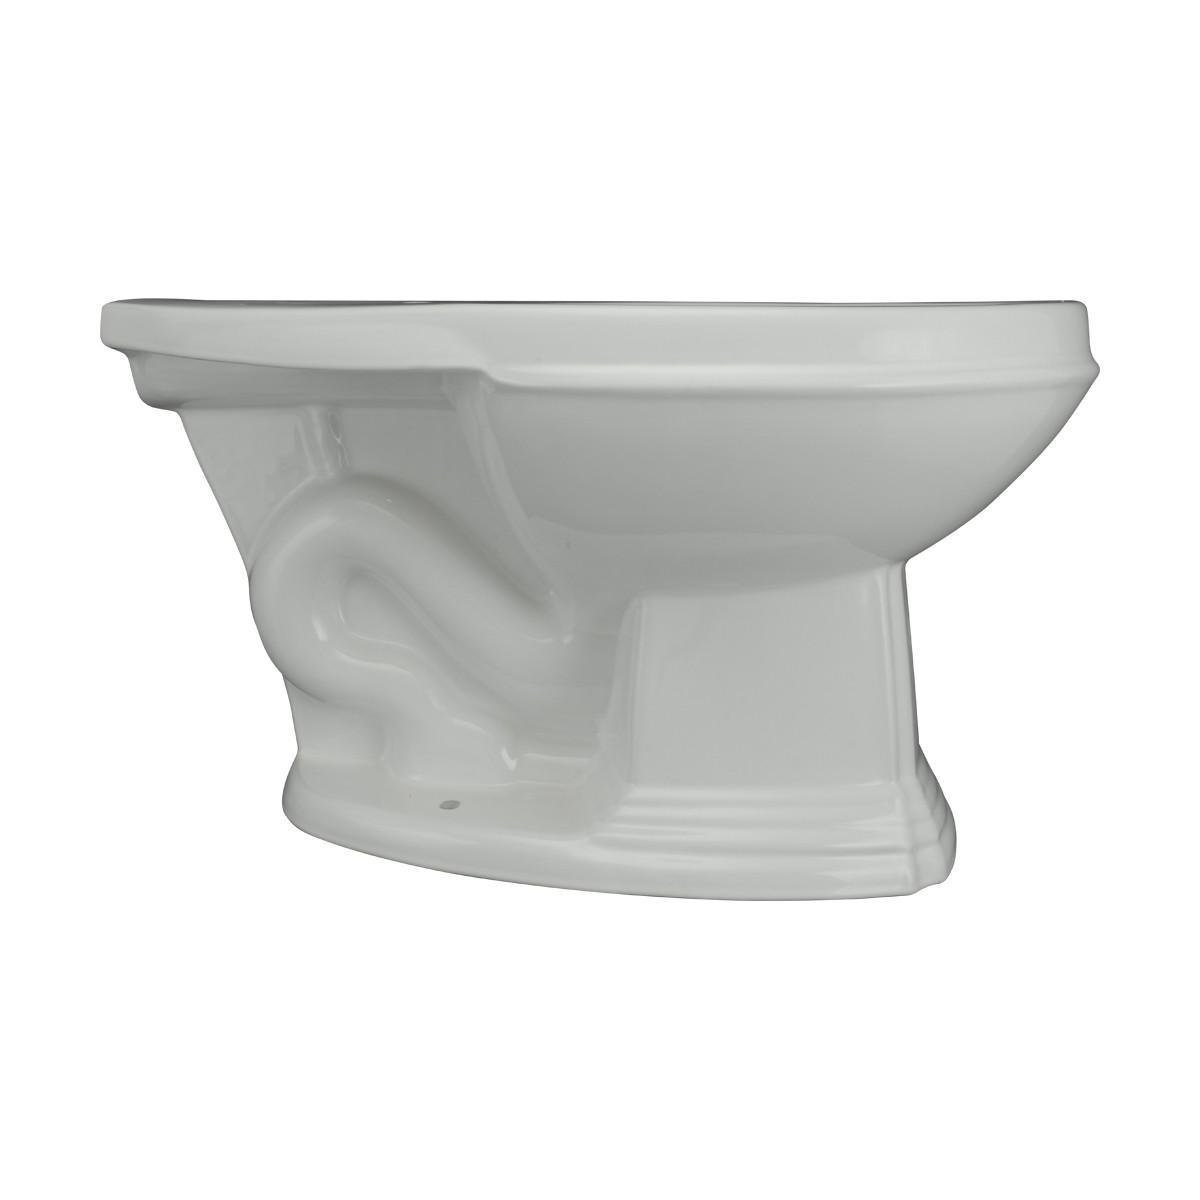 Light Oak High Tank Pull Chain Toilet with White Elongated Bowl Chrome LPipe High Tank Pull Chain Toilets Elongated Bowl High Tank Toilet Old Fashioned Toilet